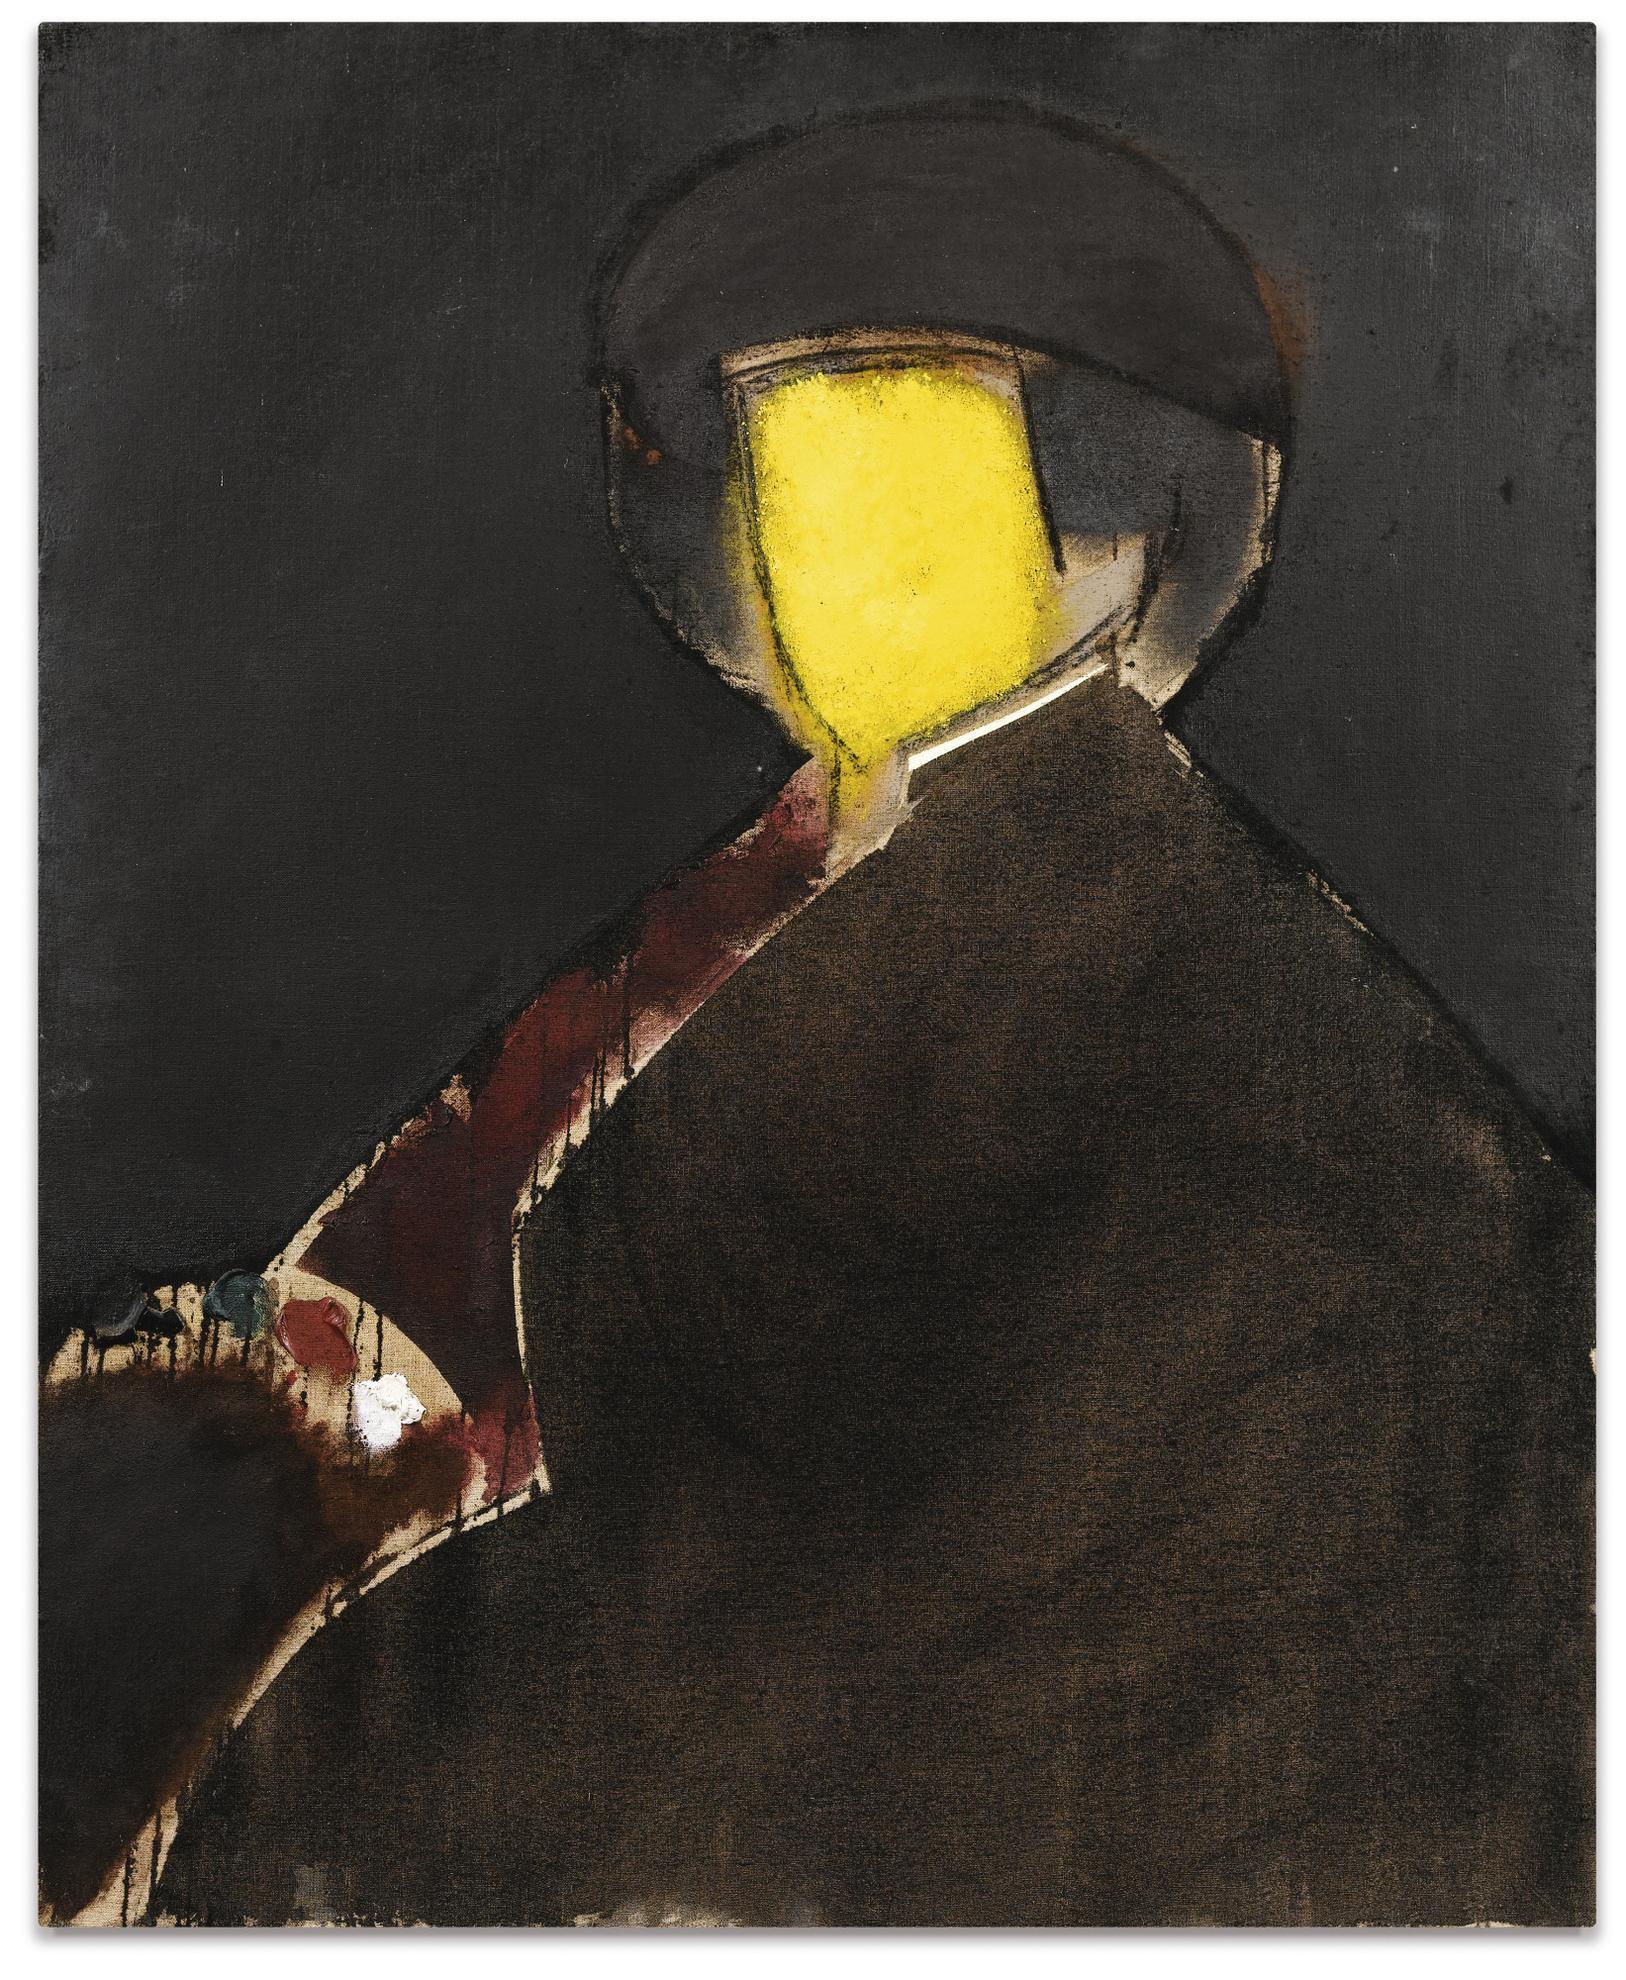 Manolo Valdes-La Paleta De Rembrandt-1987